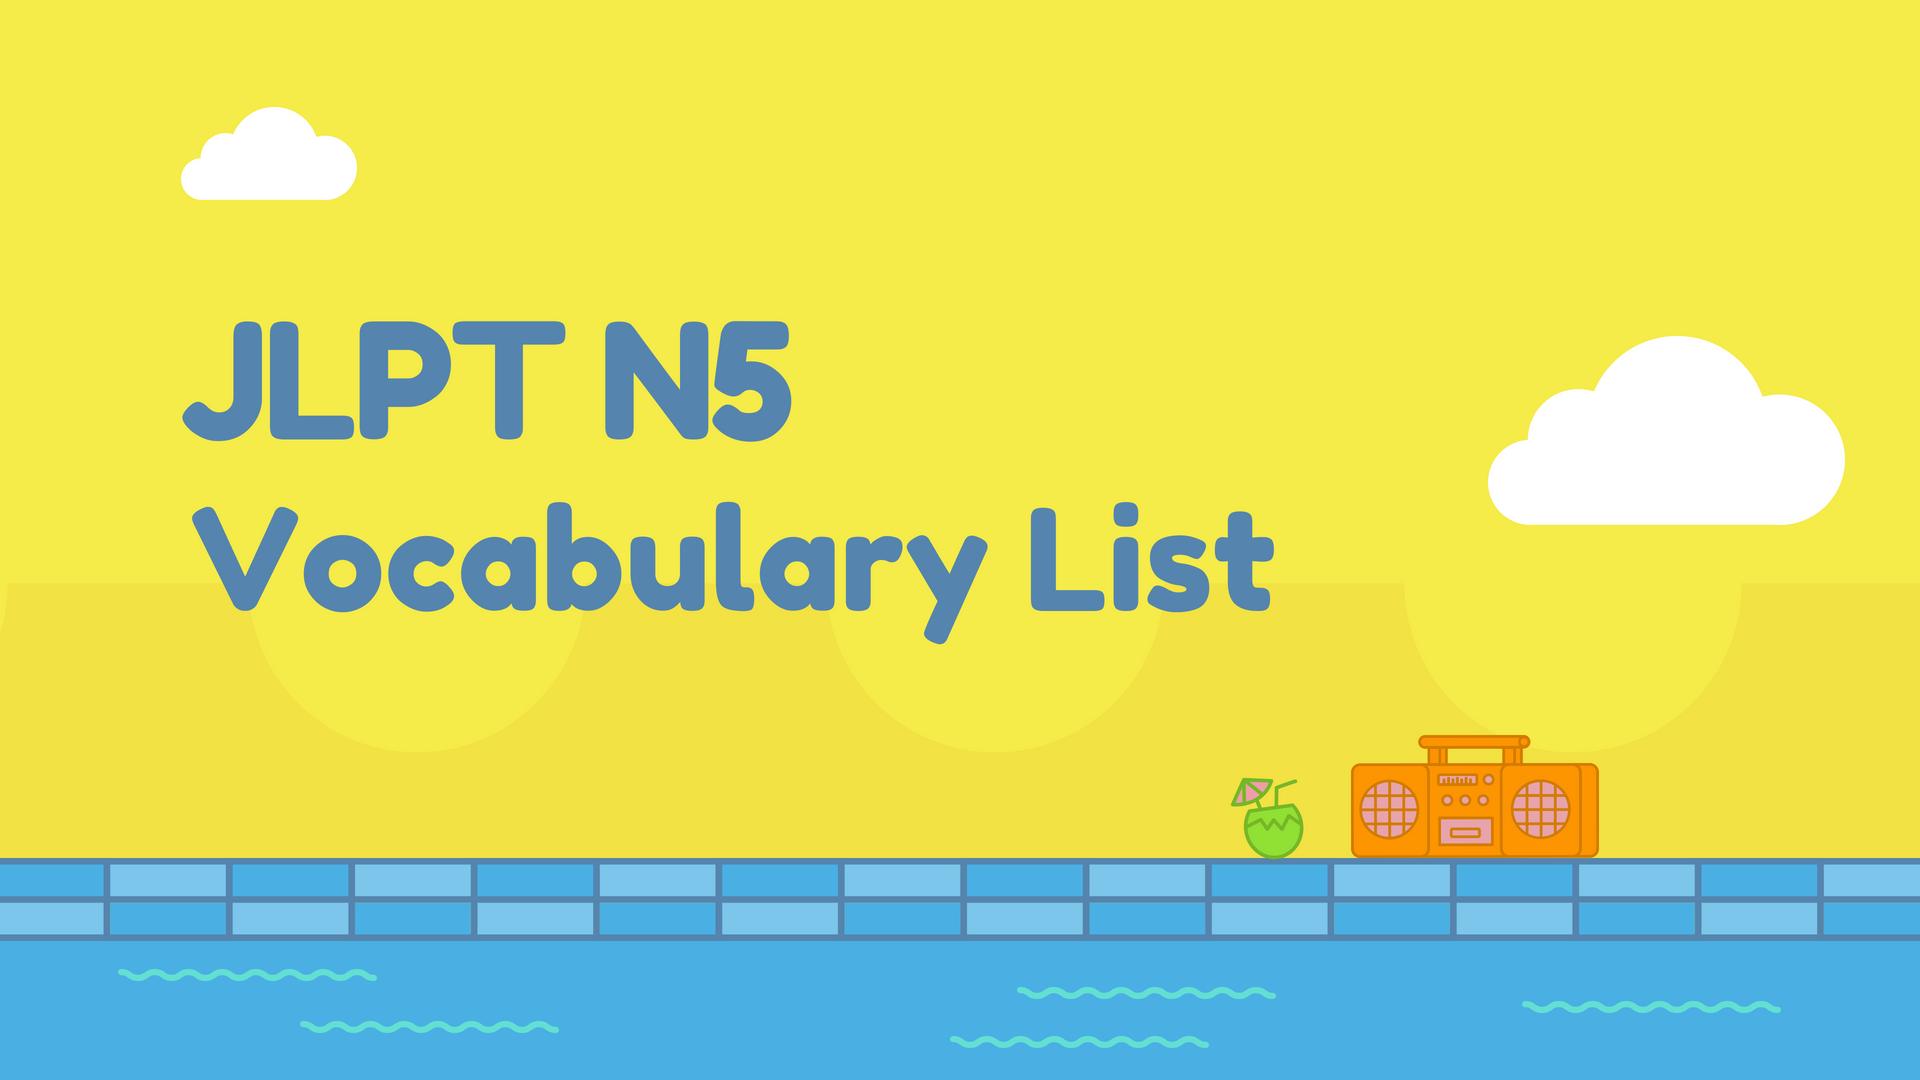 【JLPT N5】Vocabulary List